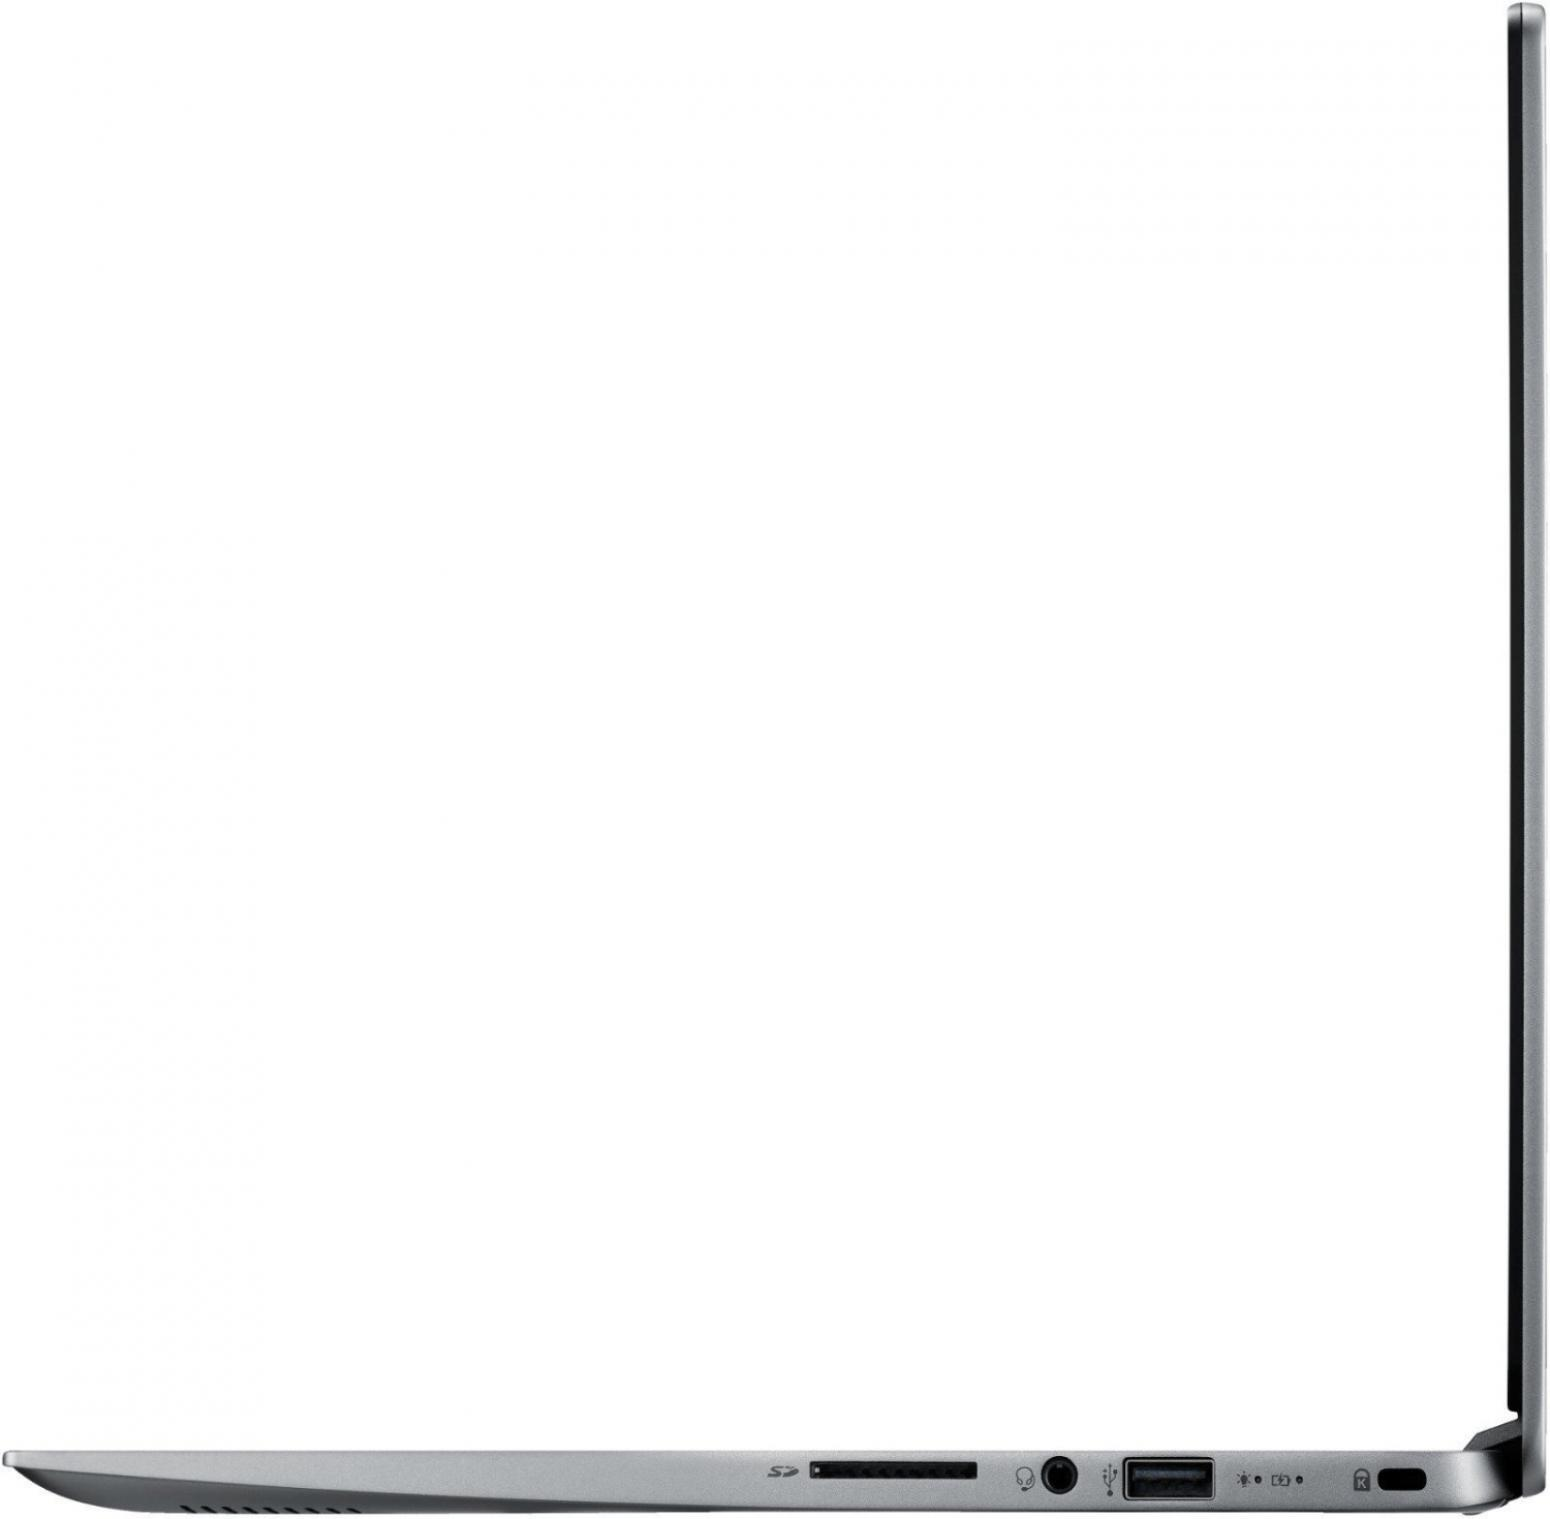 Ordinateur portable Acer Swift 1 SF114-32-P3BW Argent - Gemini Lake SSD IPS - photo 8